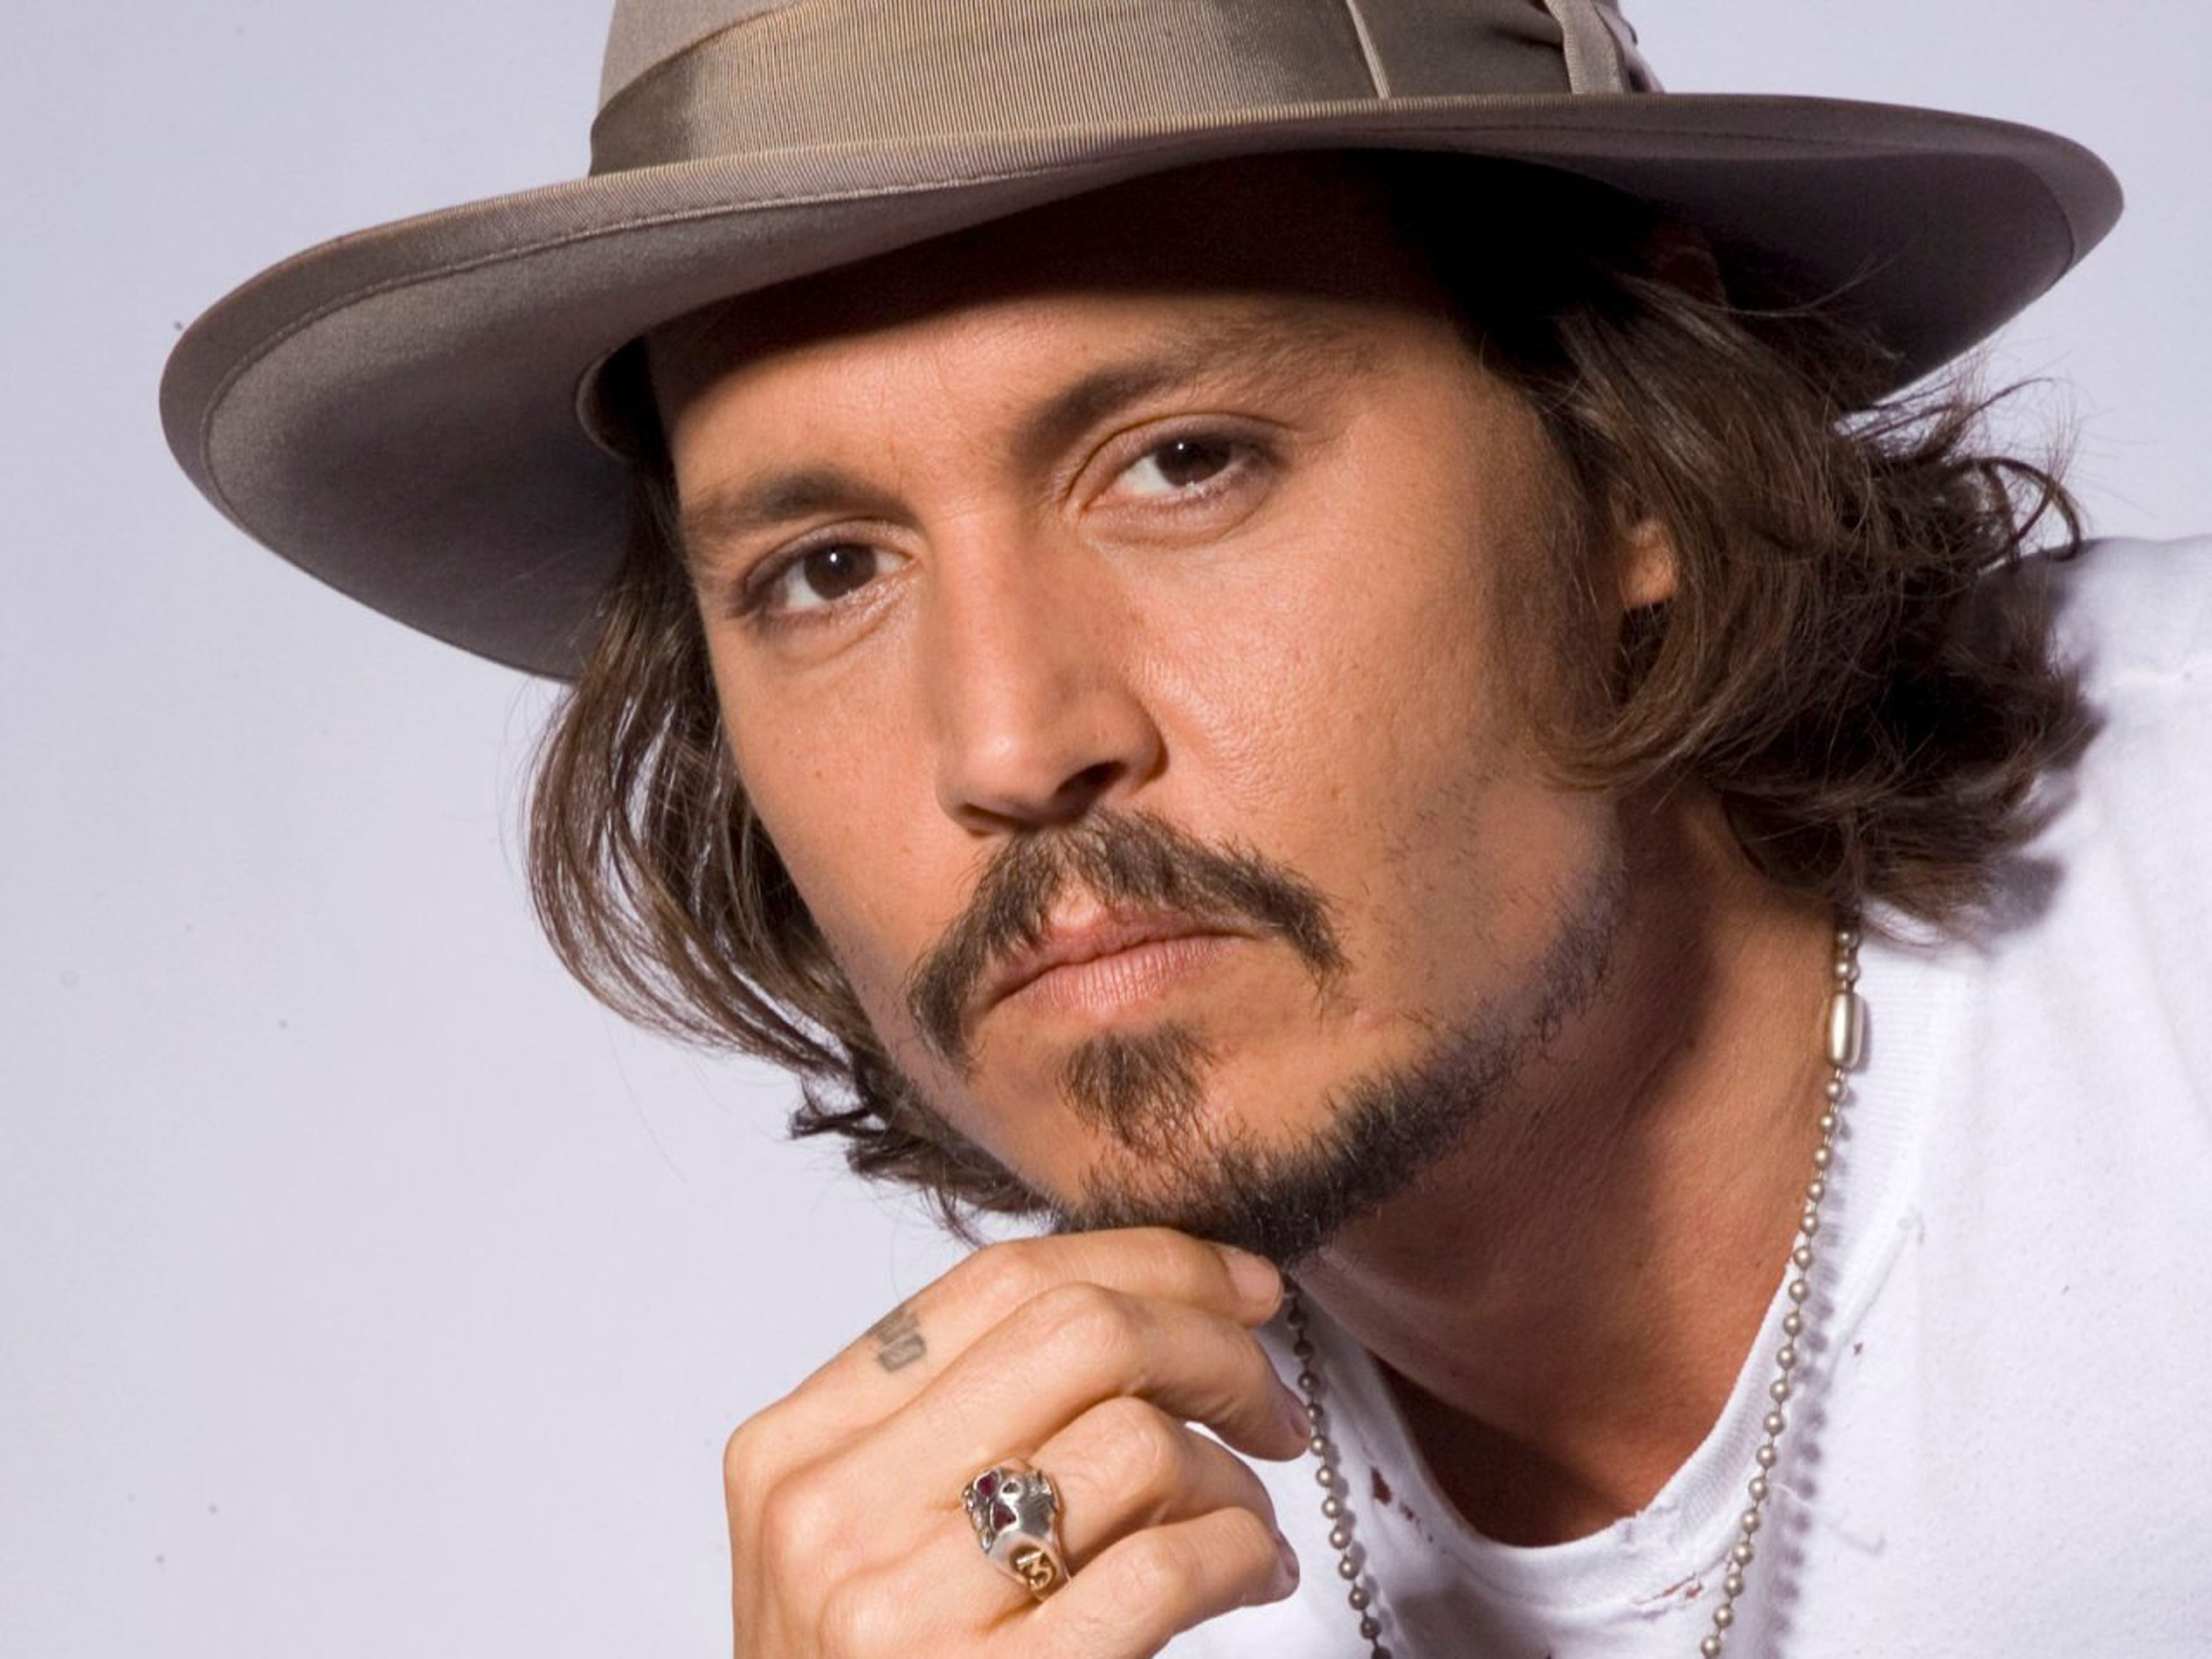 Johnny Depp notizie curiosità